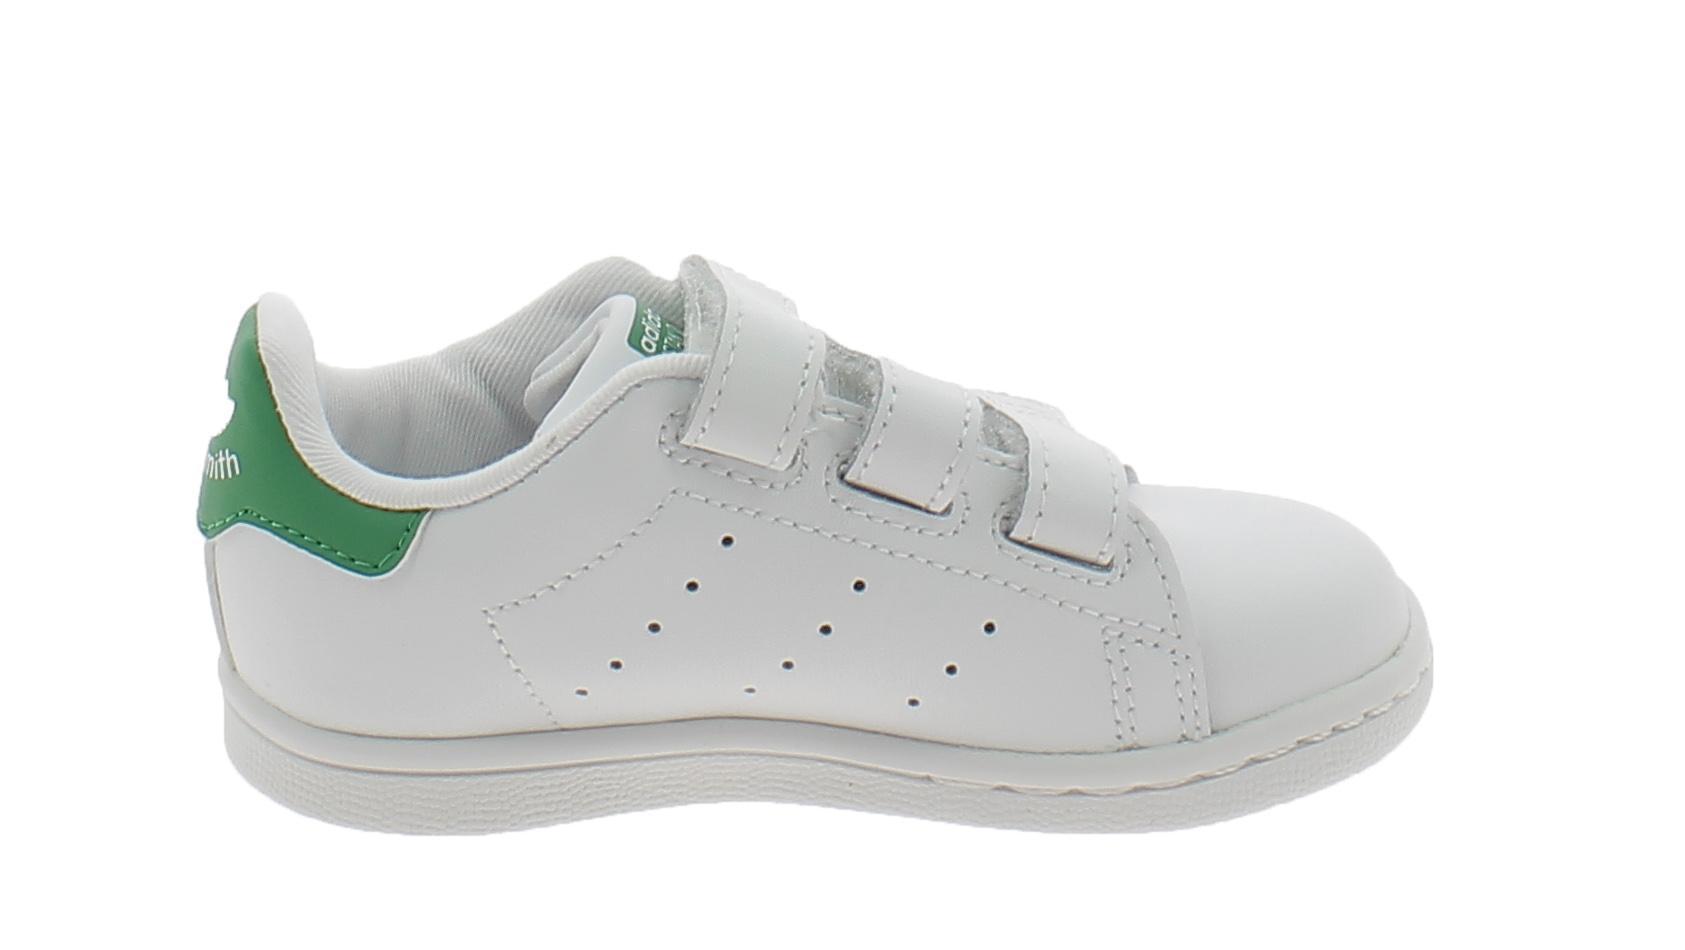 adidas adidas stan smith cf scarpe sportive strappi bianche verdi bz0520